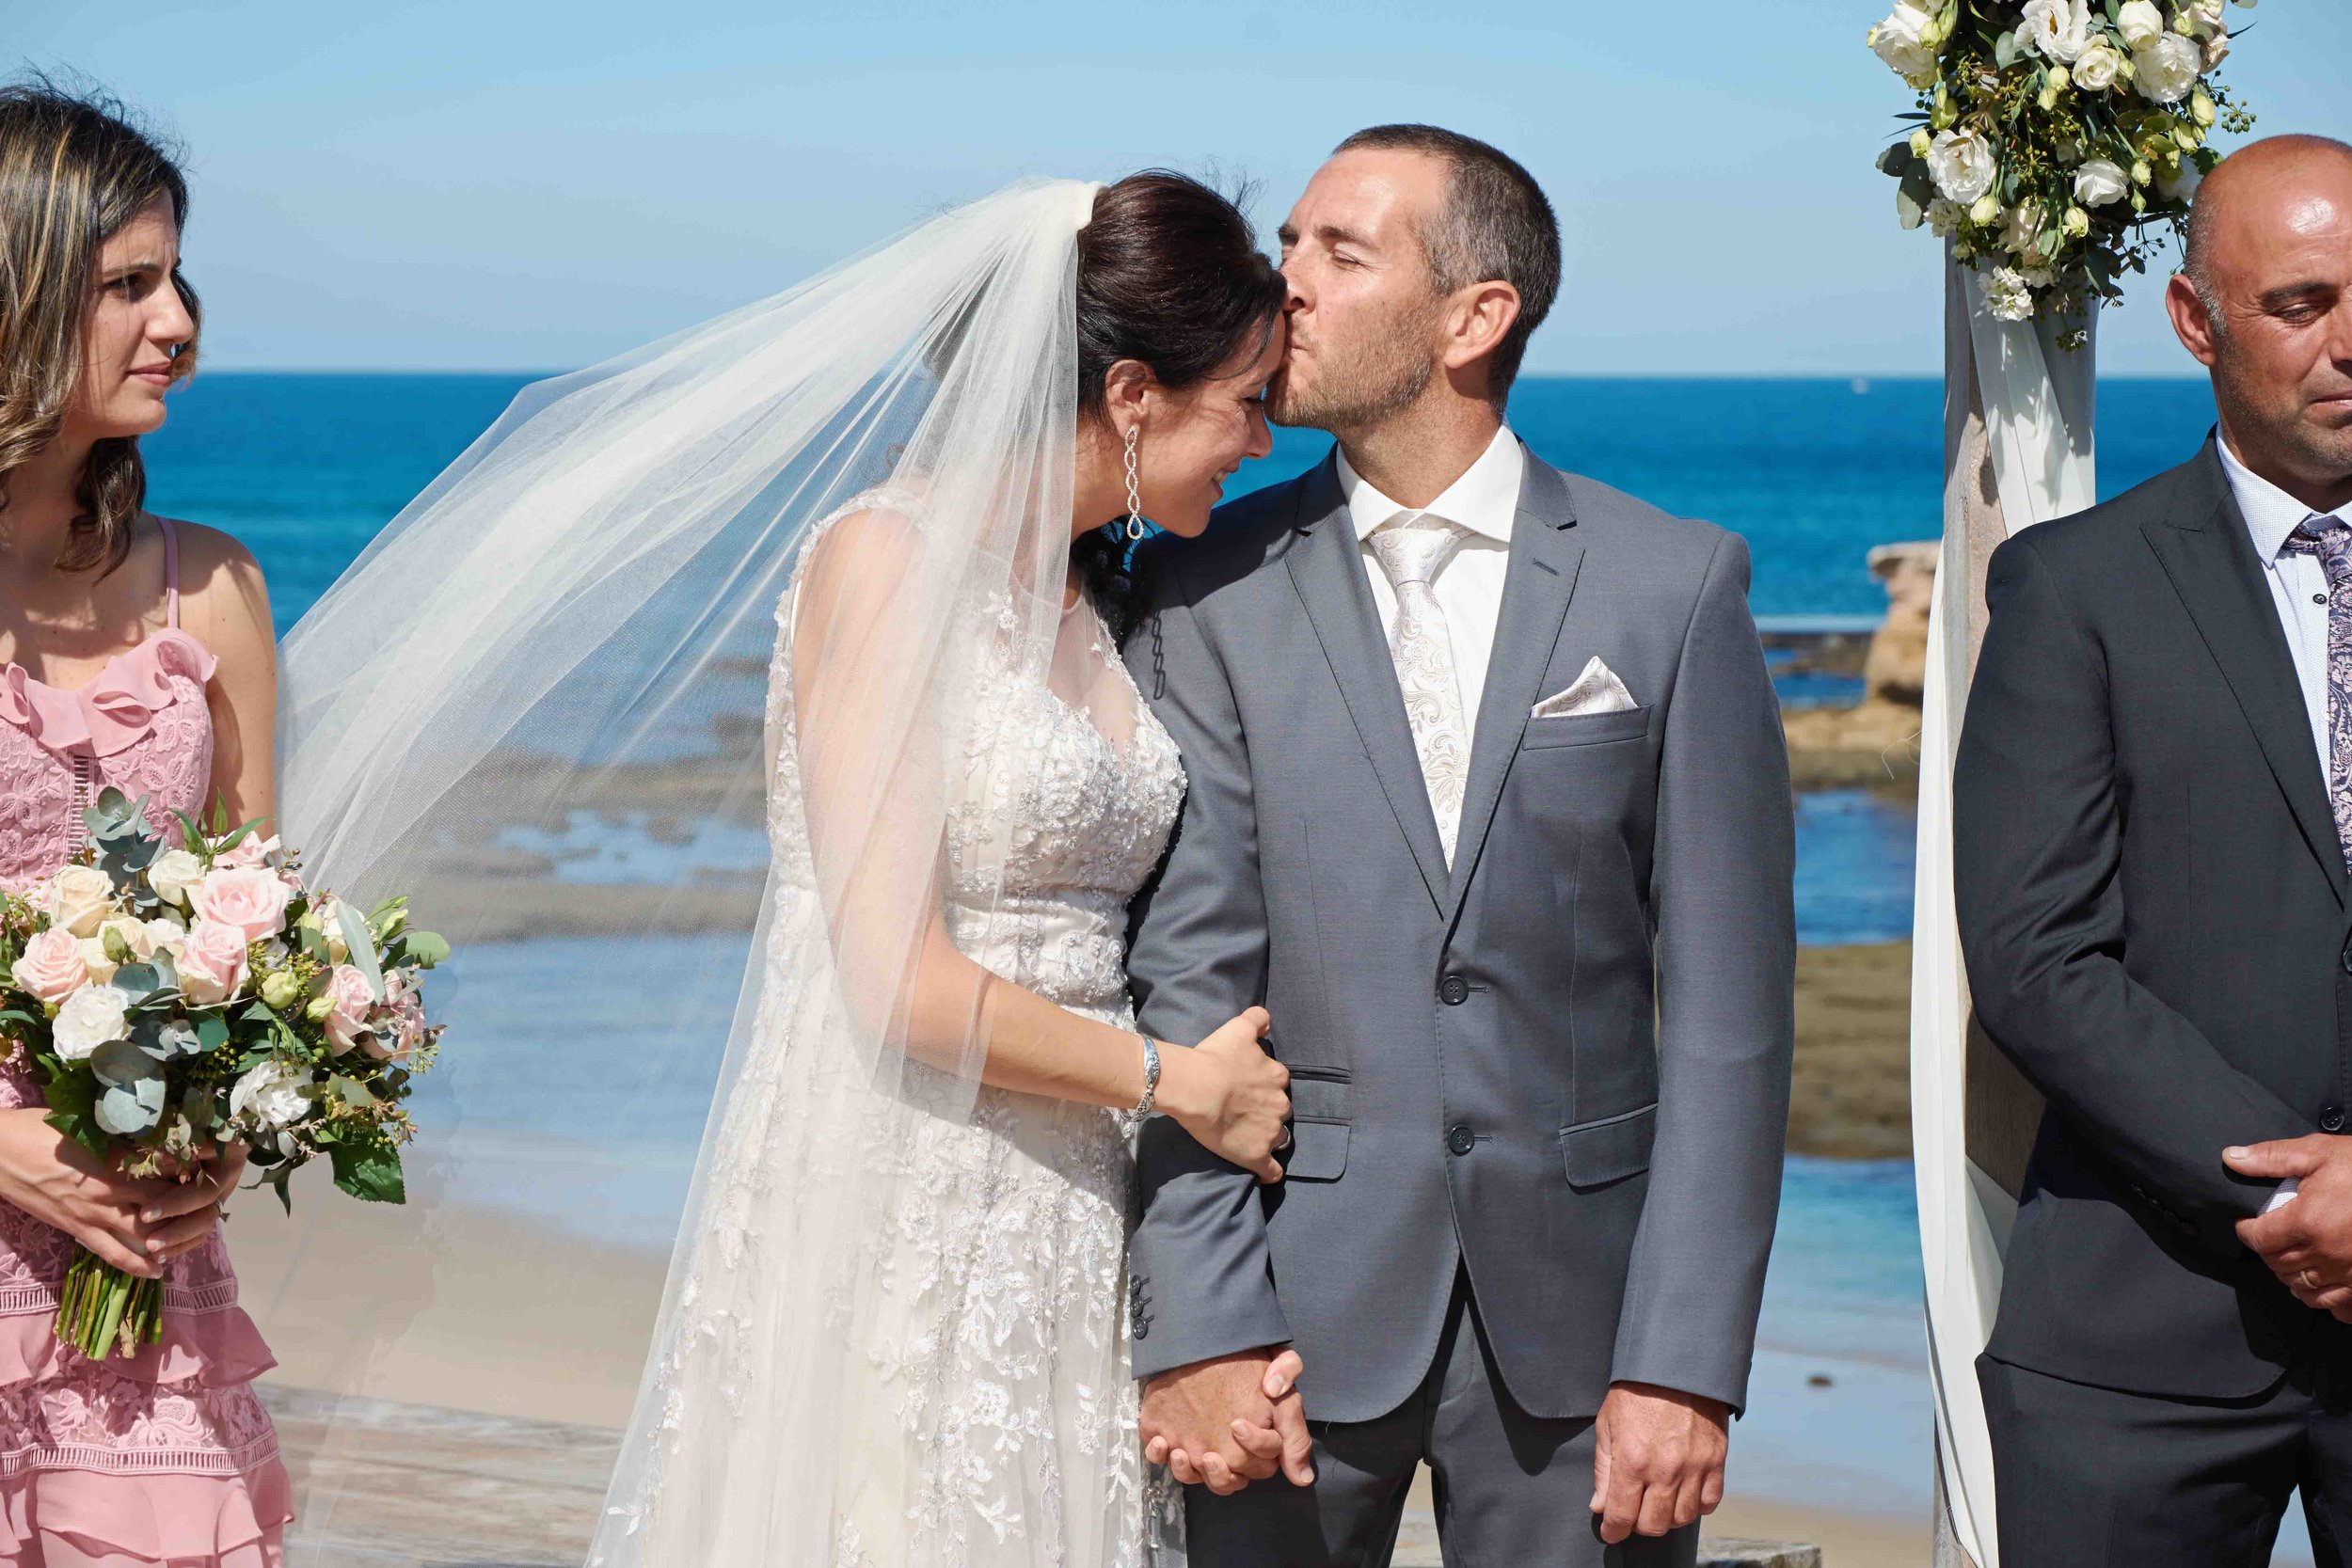 sorrento-wedding-photography-all-smiles-marissa-jade-photography-47.jpg